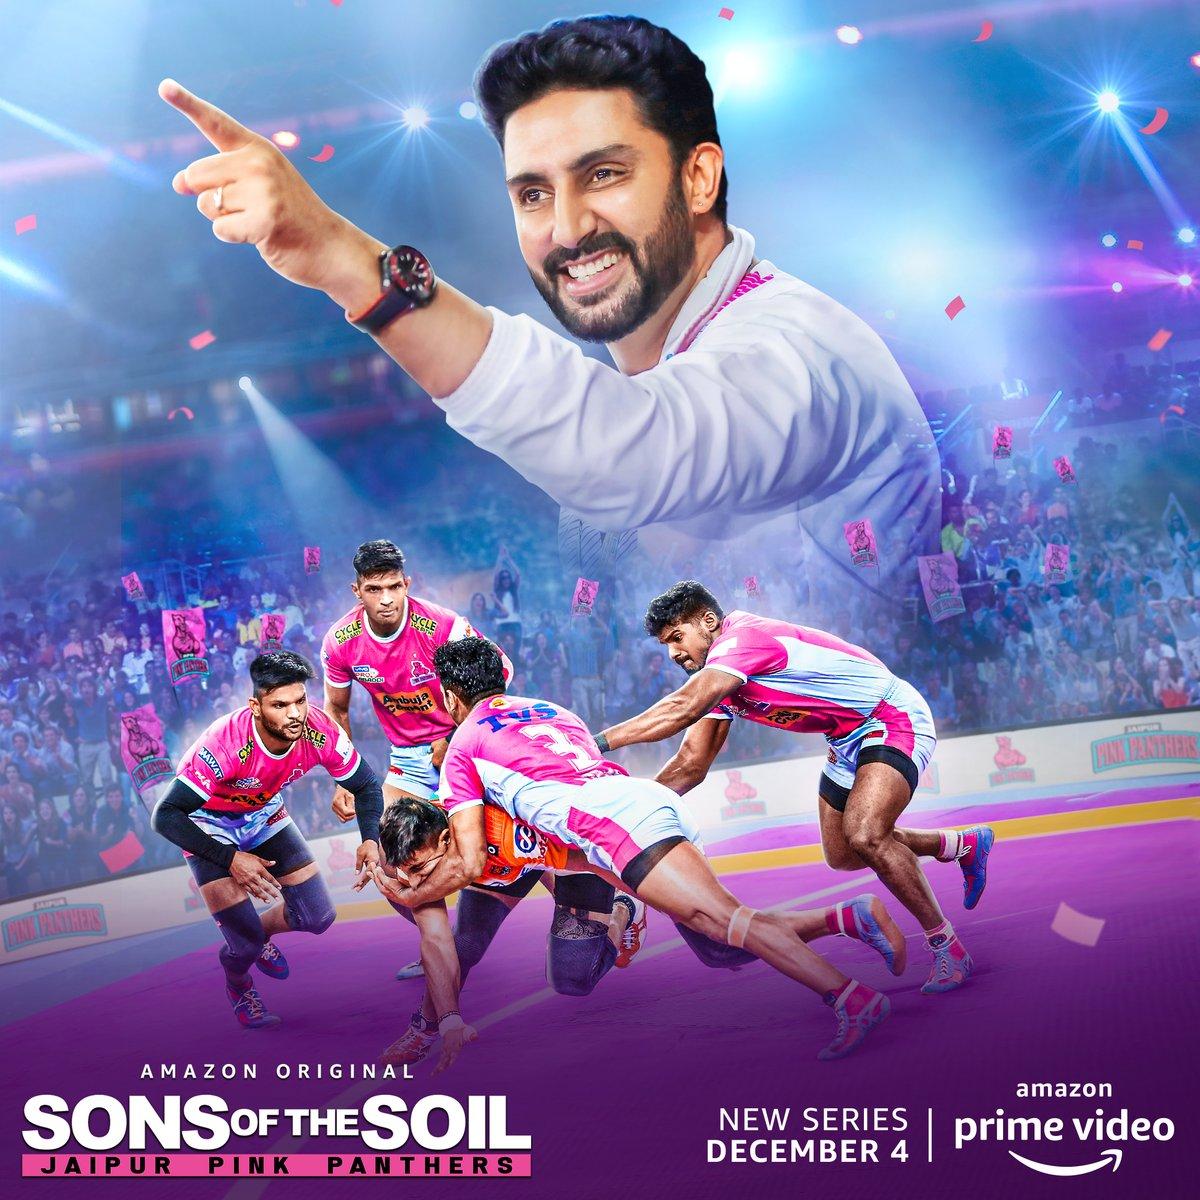 Jitne buland team ke hausle hain, utni hi yadgaar hai iss team ki kahaani. #SonsOfTheSoil Trailer Out Tomorrow, on @PrimeVideoIN   @juniorbachchan @bunty_walia @JaipurPanthers @DeepakHooda5555 @Lsrinivasreddy9 @nitinrkabaddi